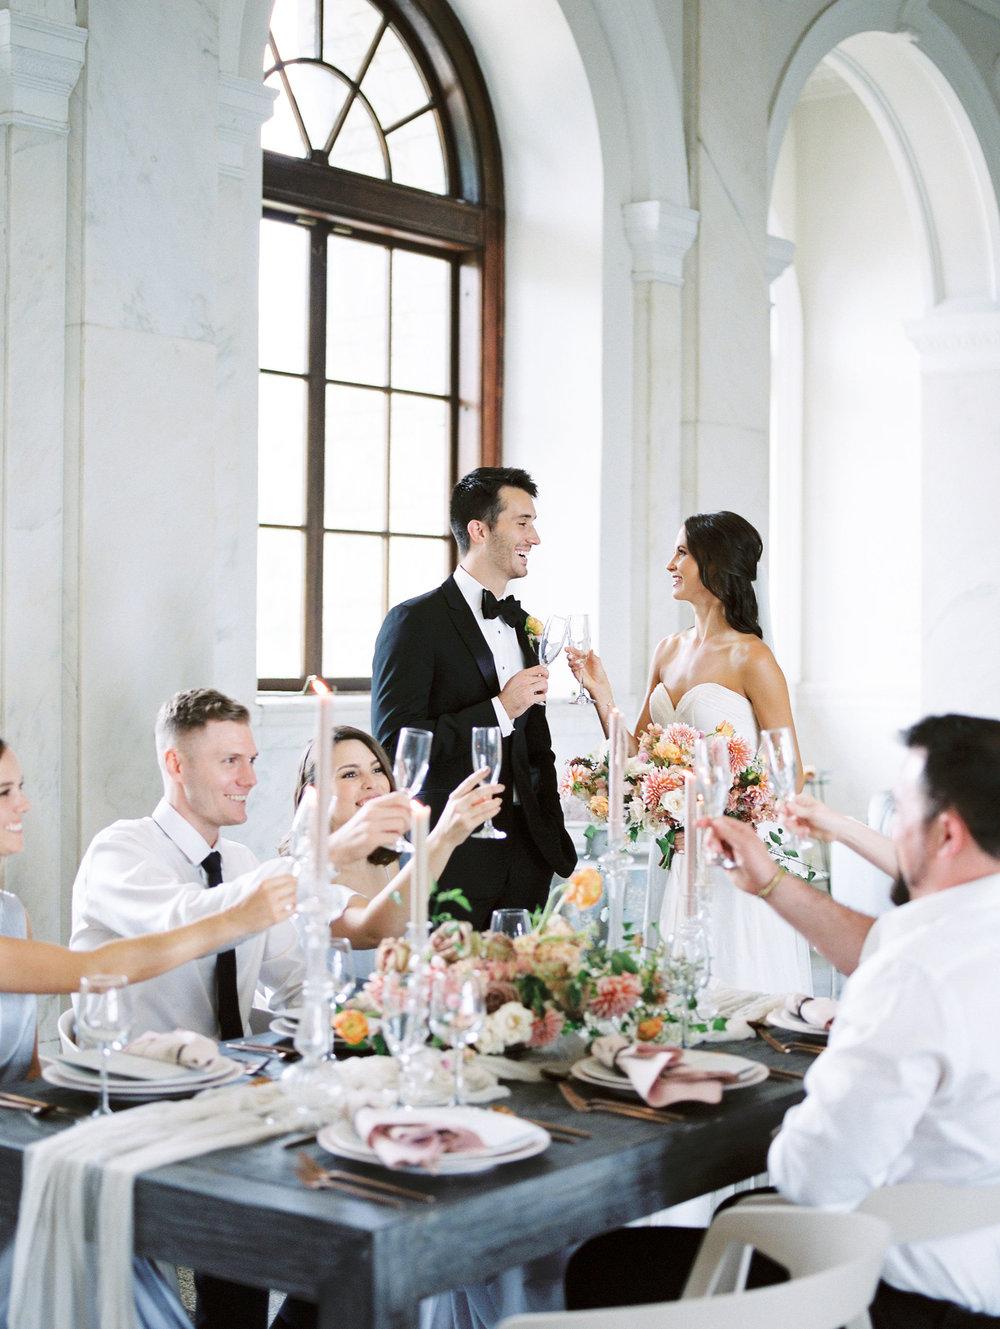 www.hannahforsberg.com-delkab-court-house-wedding-decatur-atlanta-wedding-photographer-139.jpg